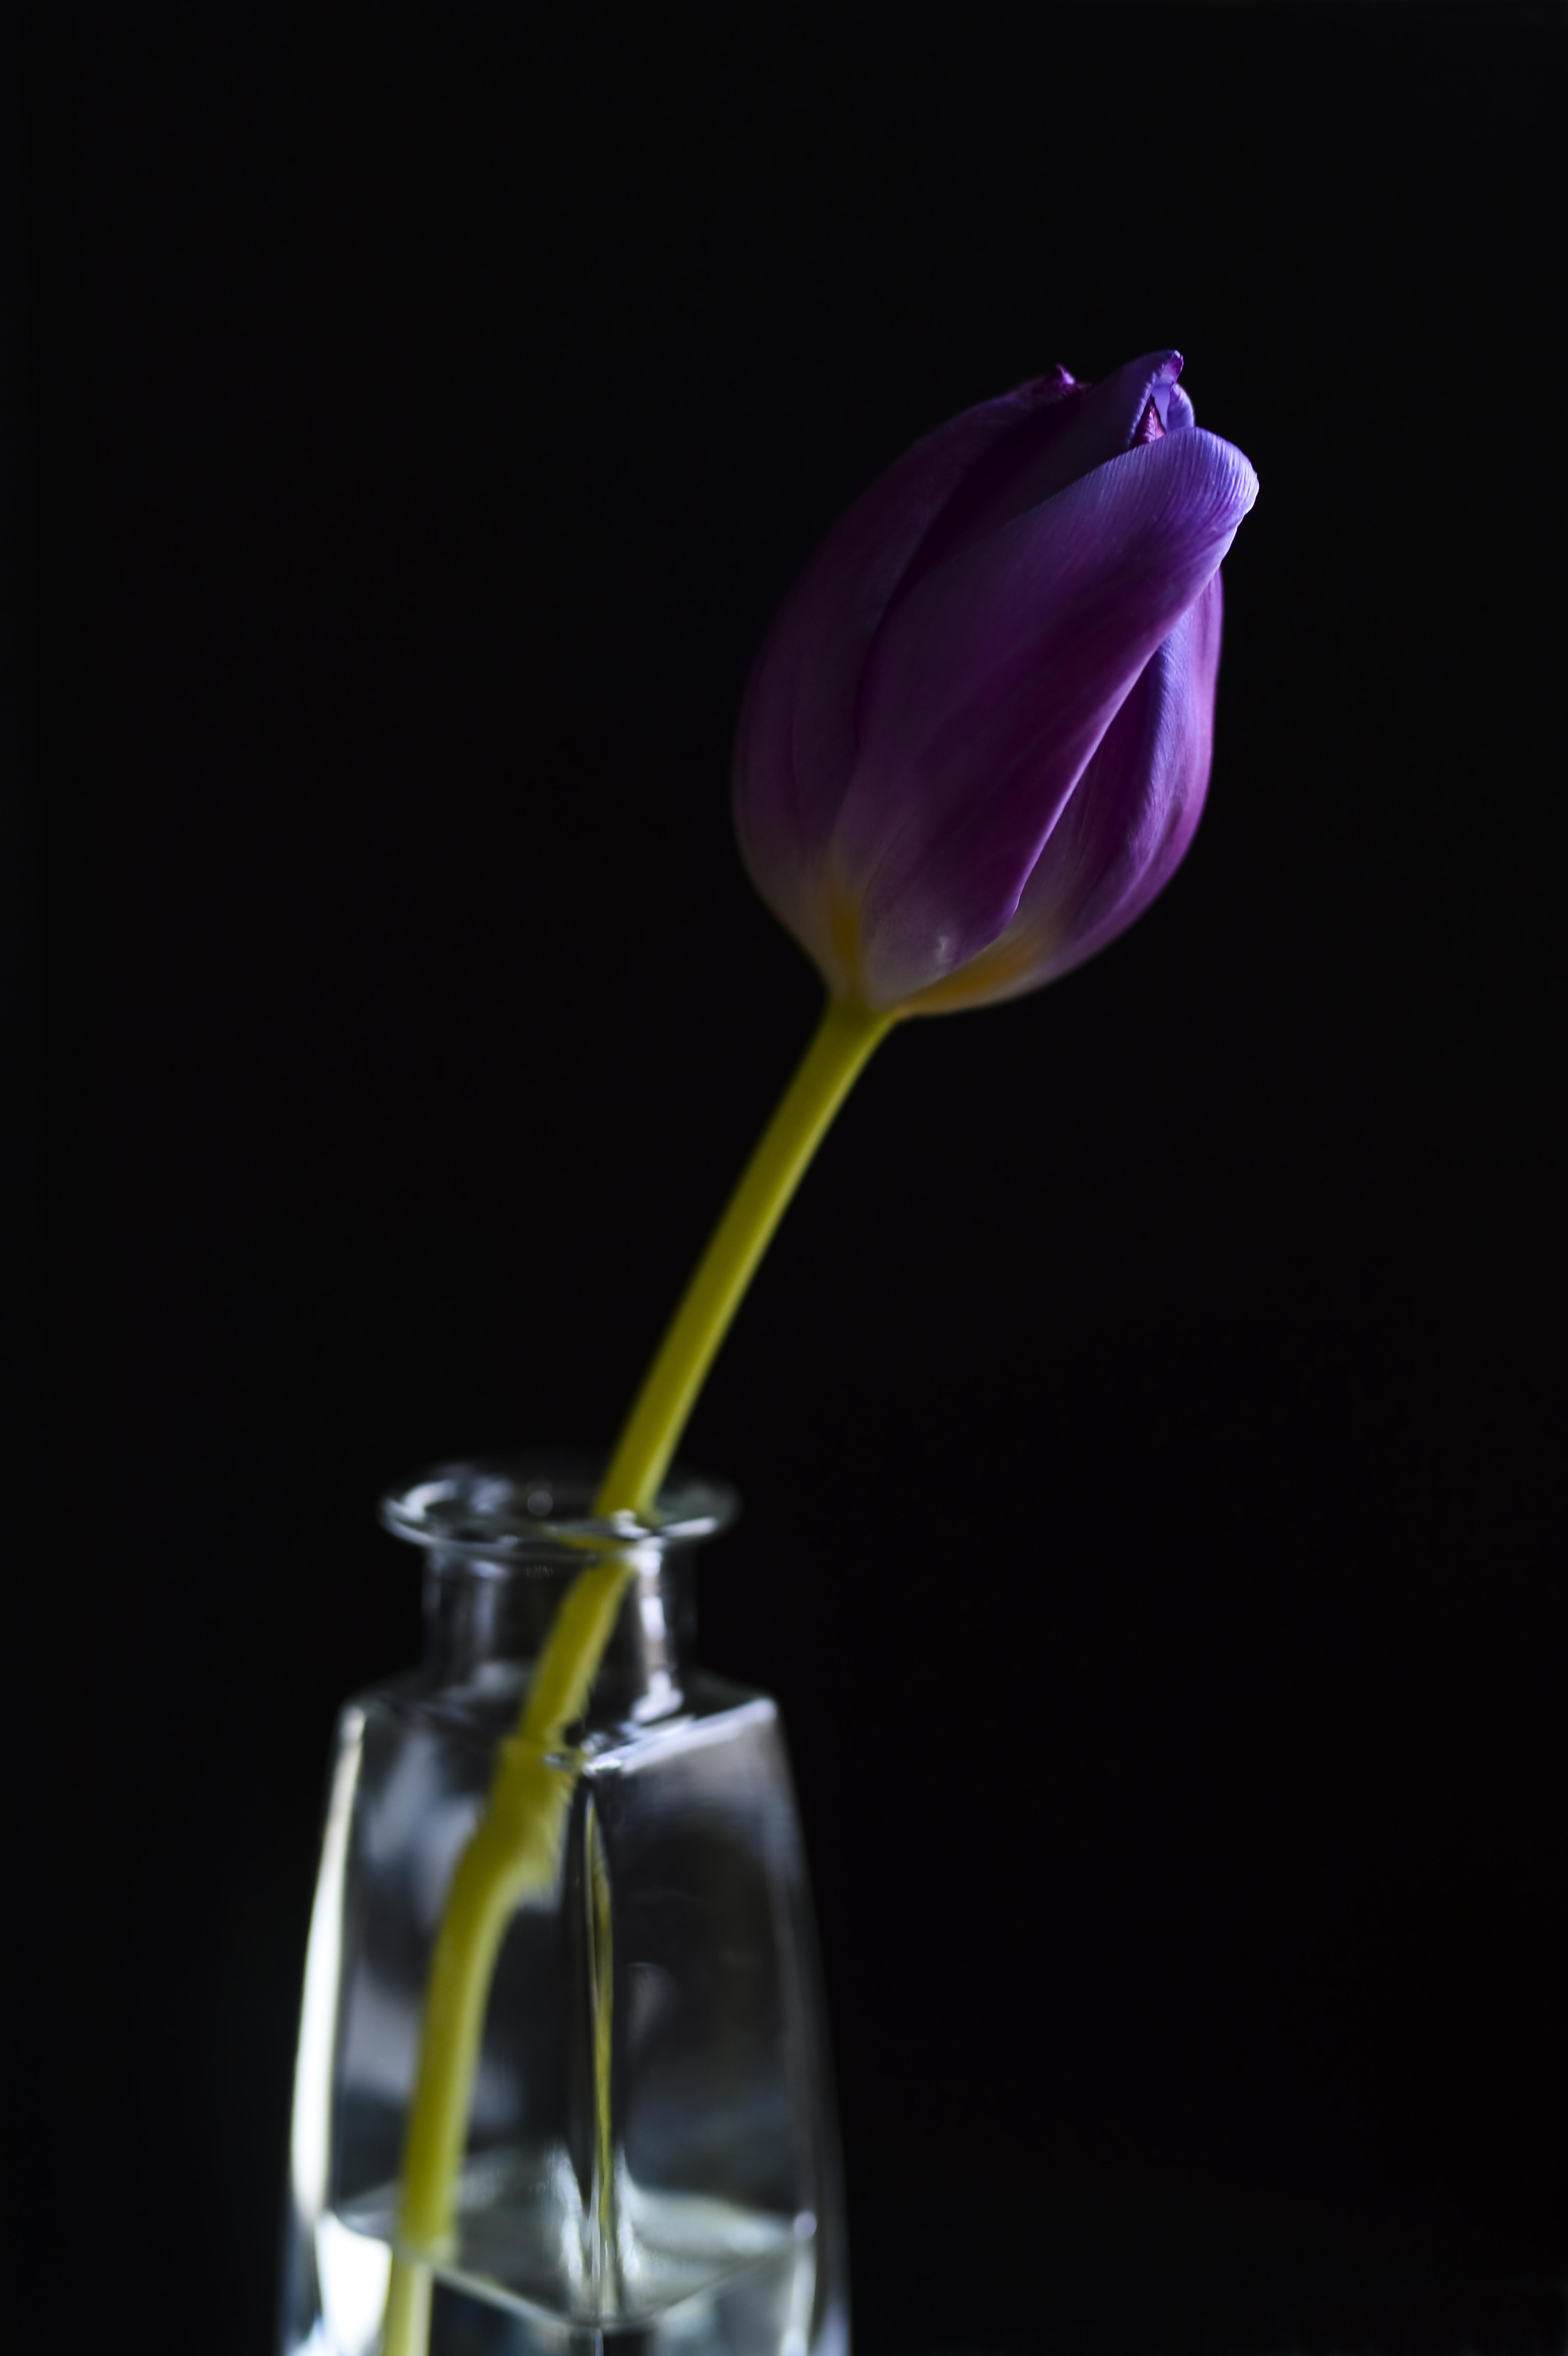 Lila Tulpe, Tulip ©Johannes Ratermann